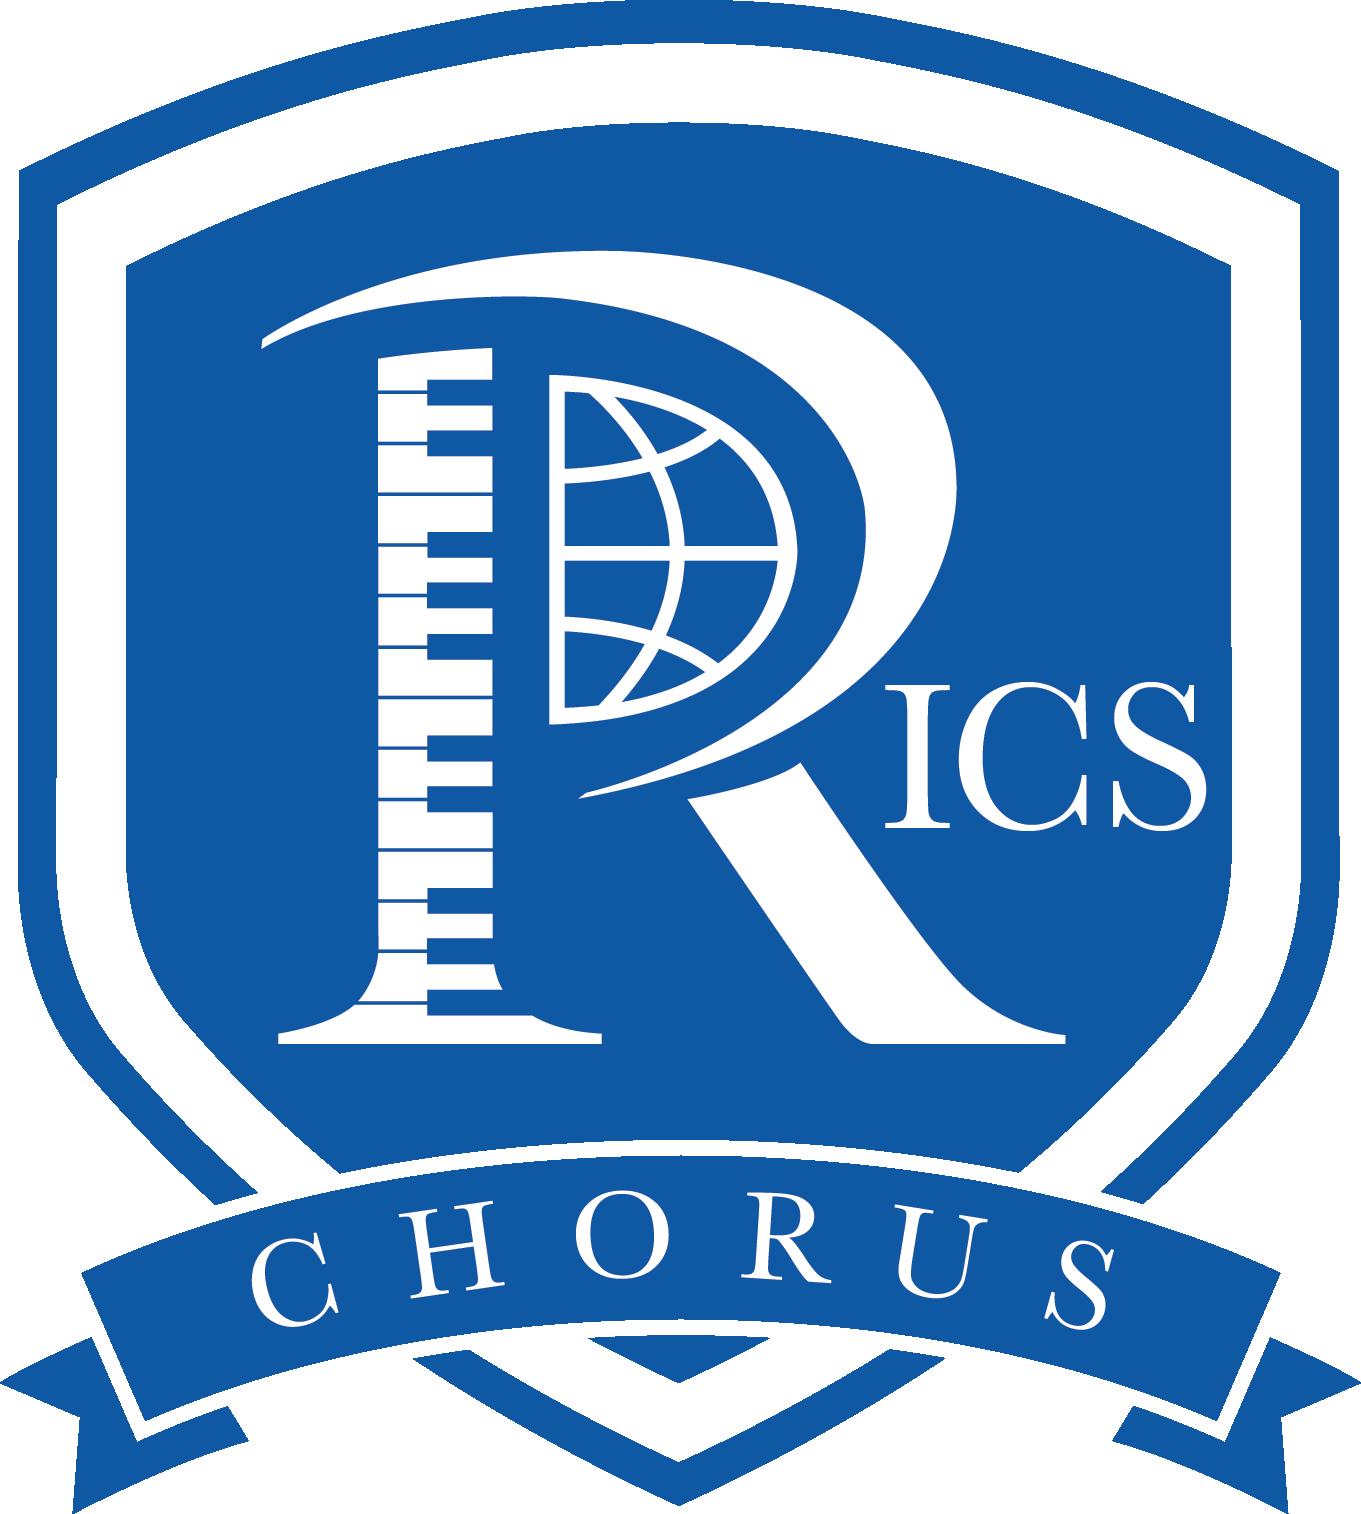 Singer clipart elementary chorus. Pin by nancy bain